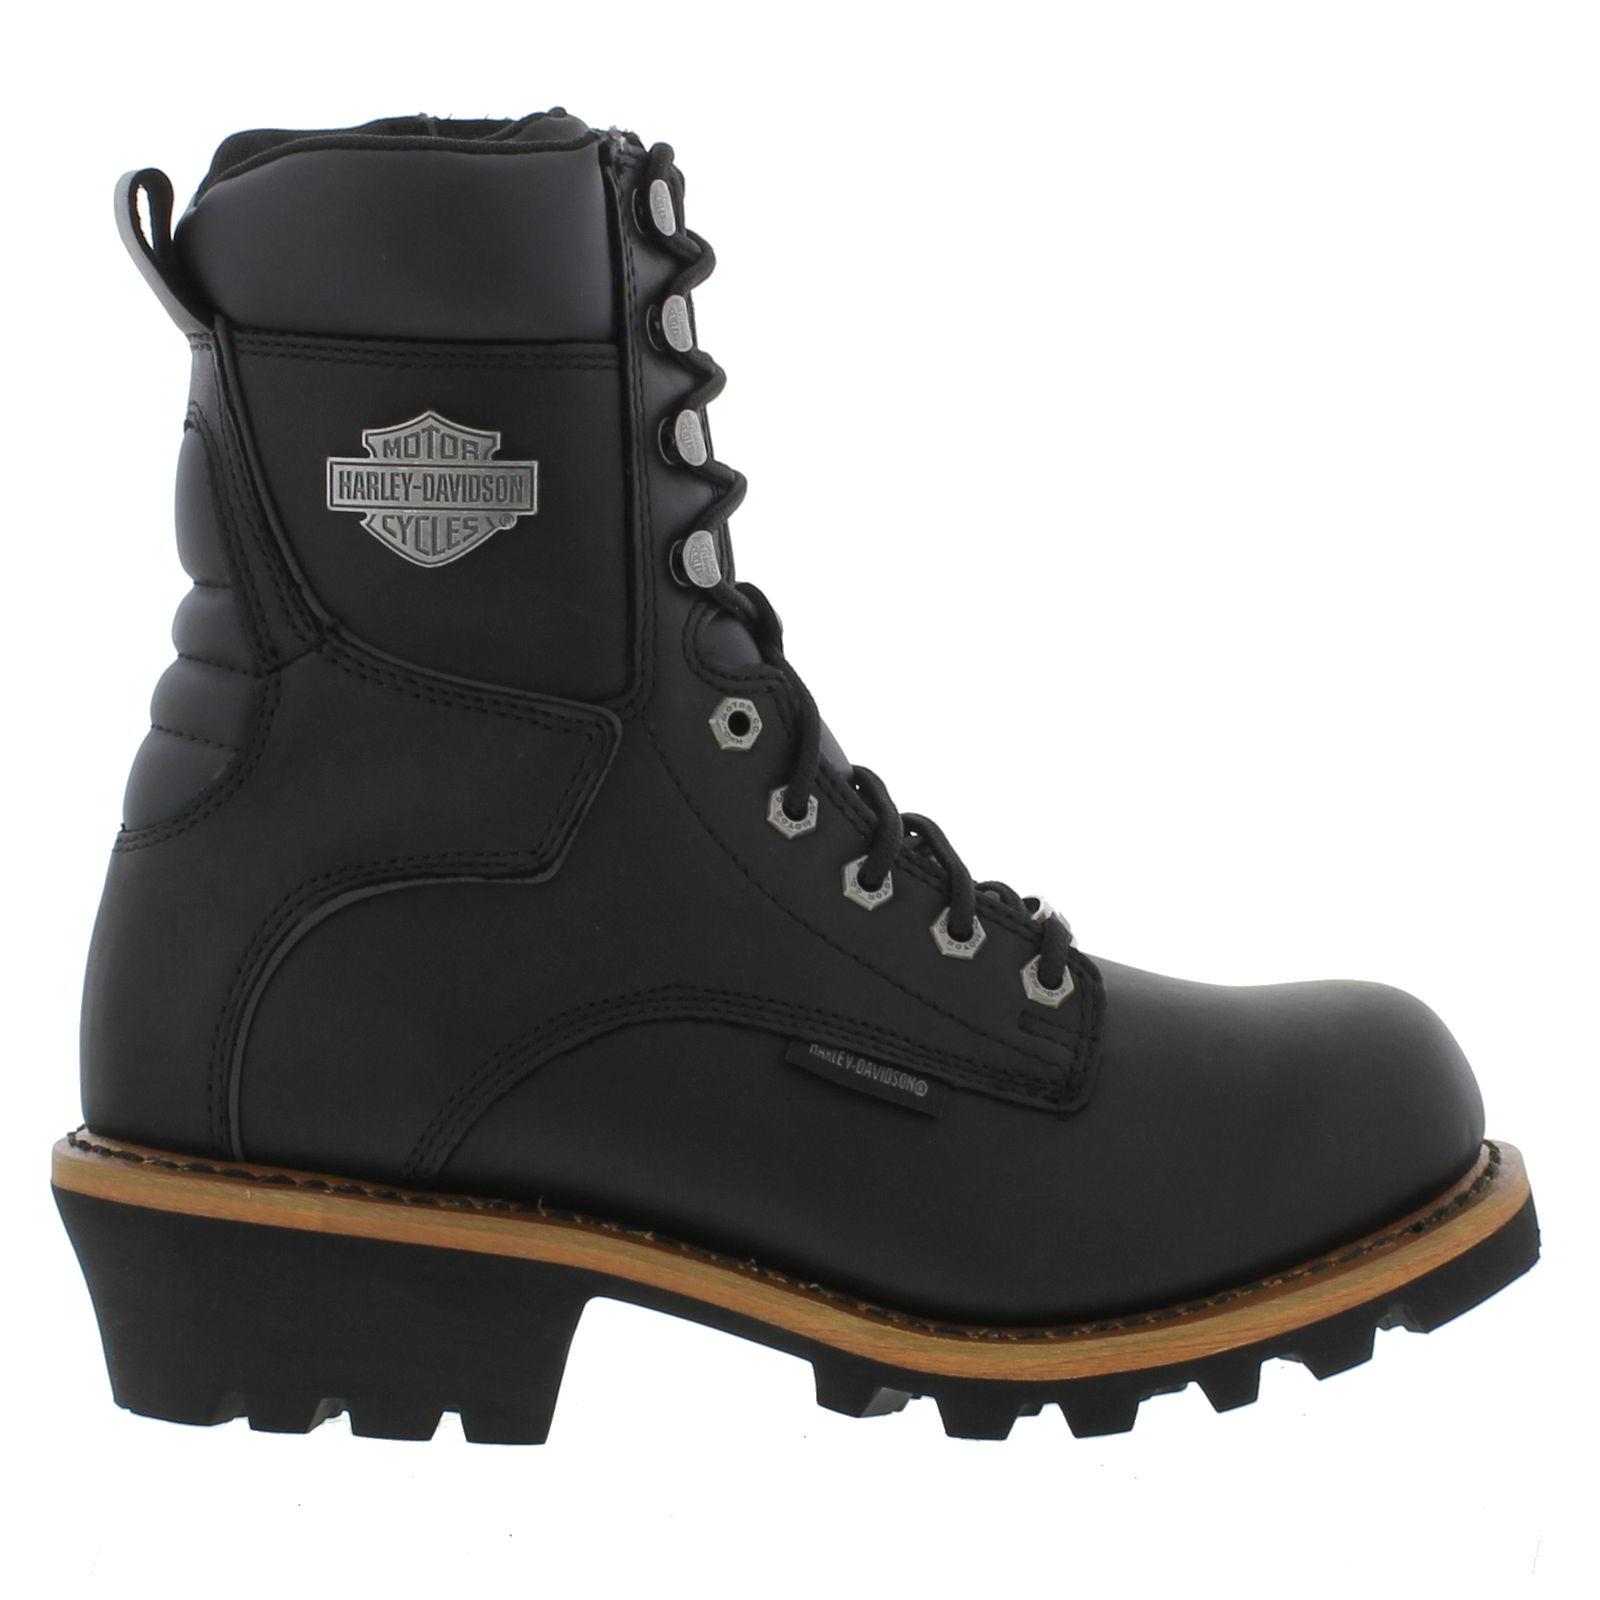 Harley Davidson Black Tyson Logger Boots